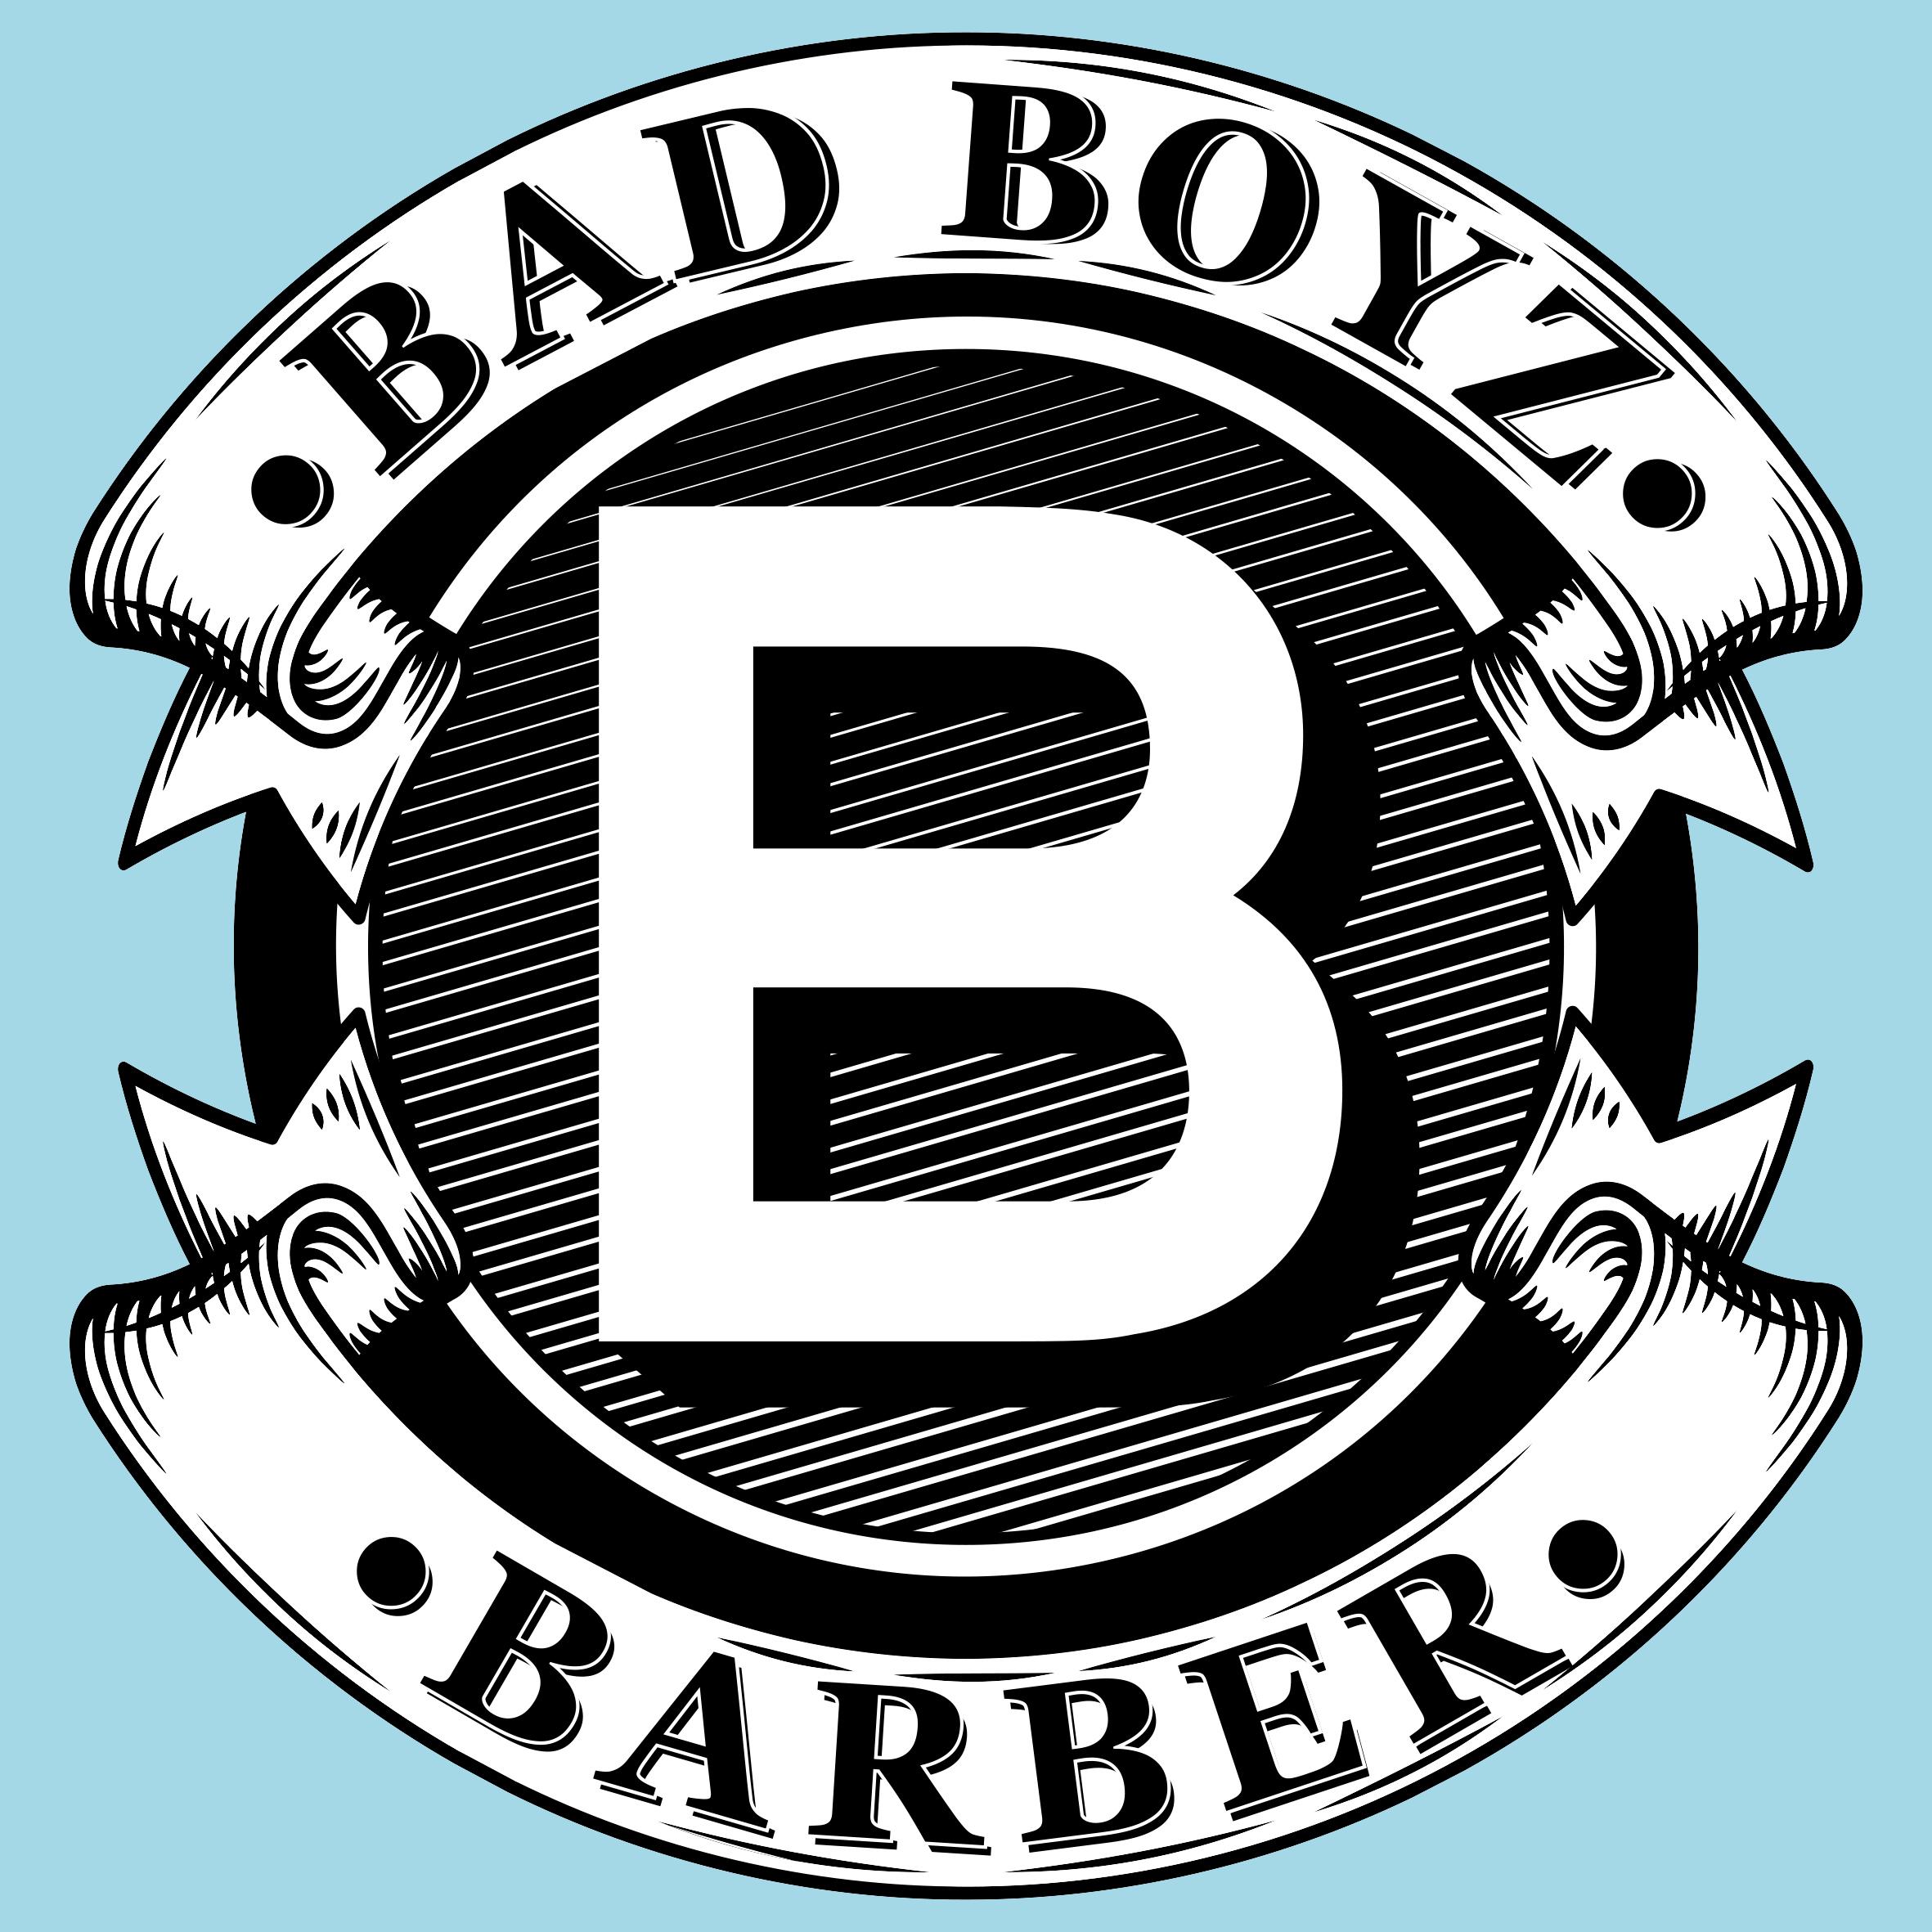 Bad Boyz Barber